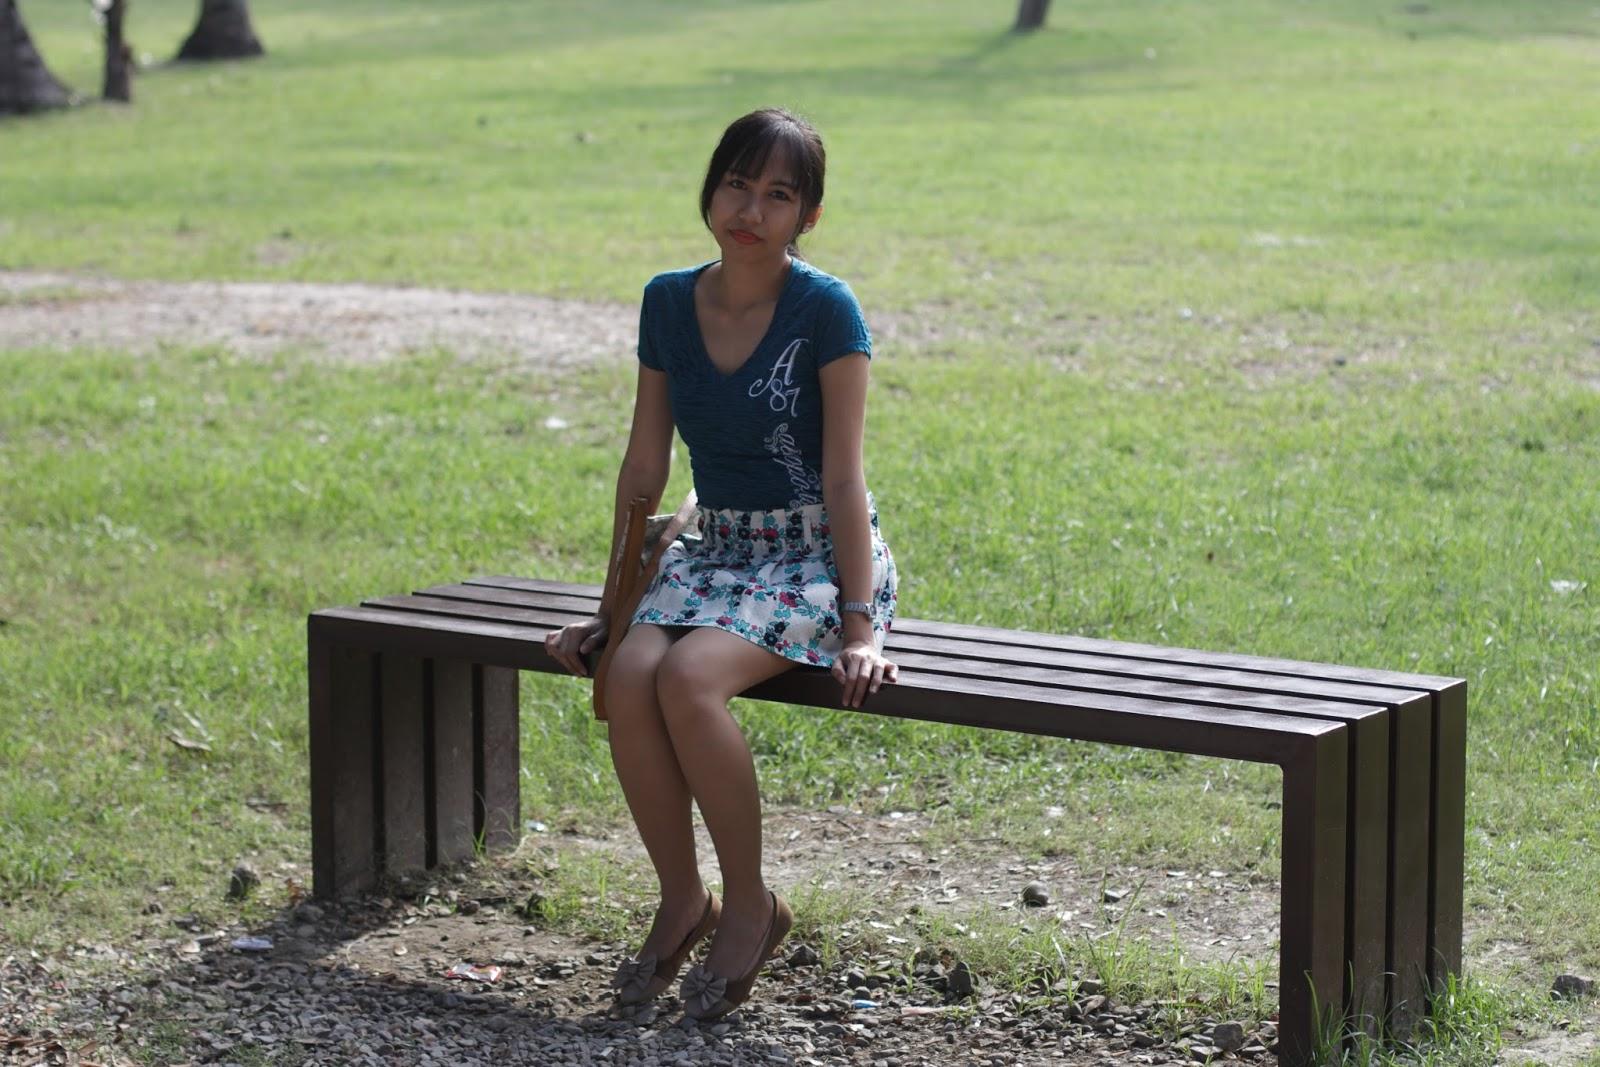 strolling around the park